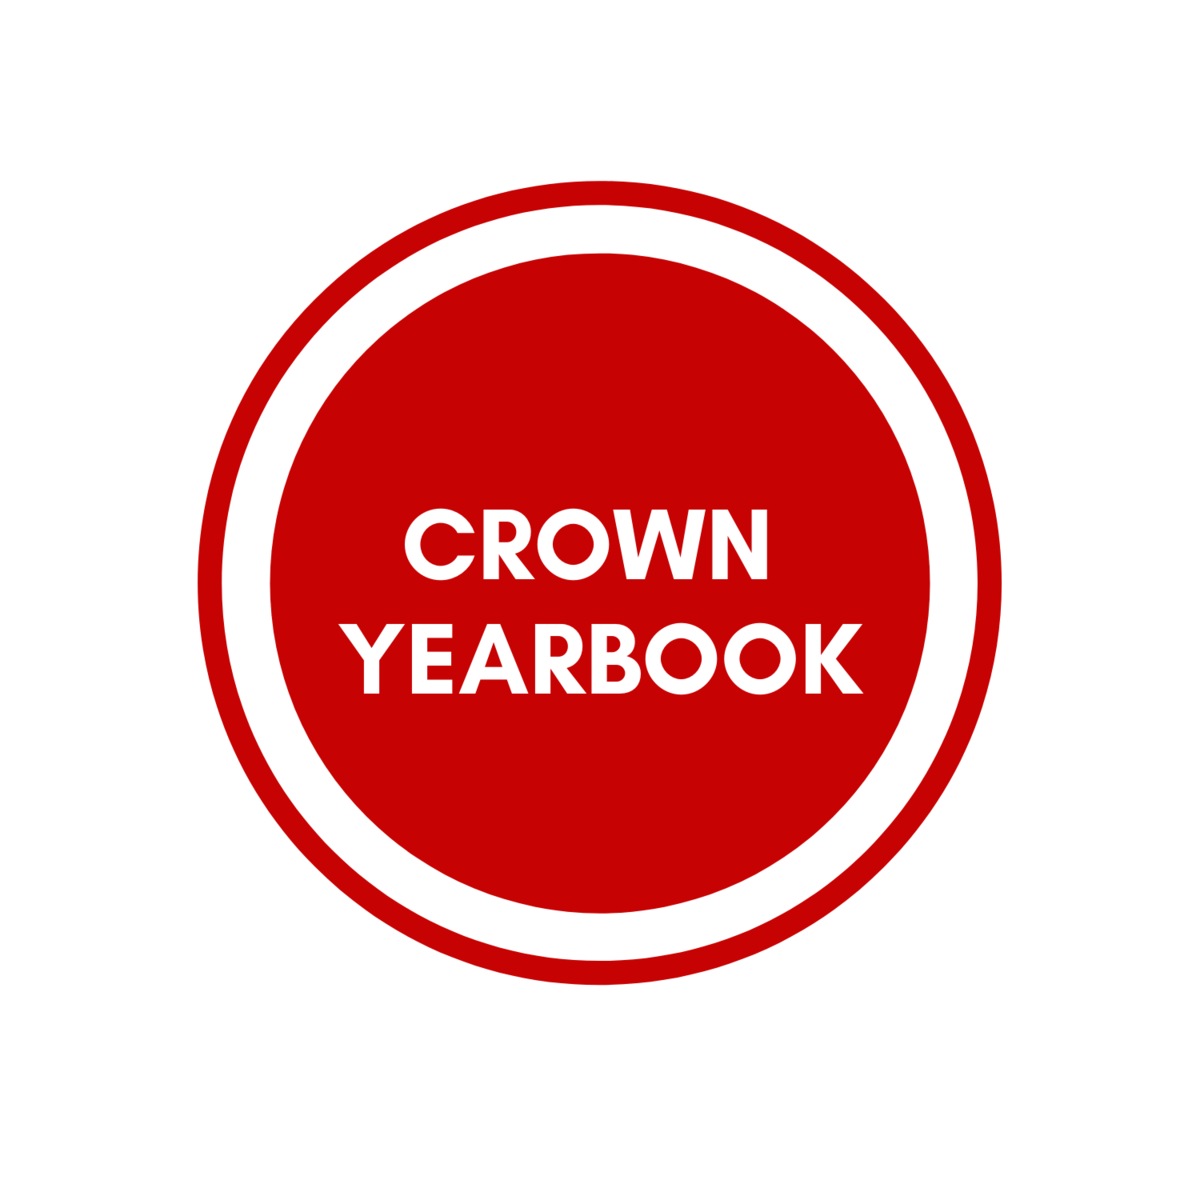 Crown Yearbook